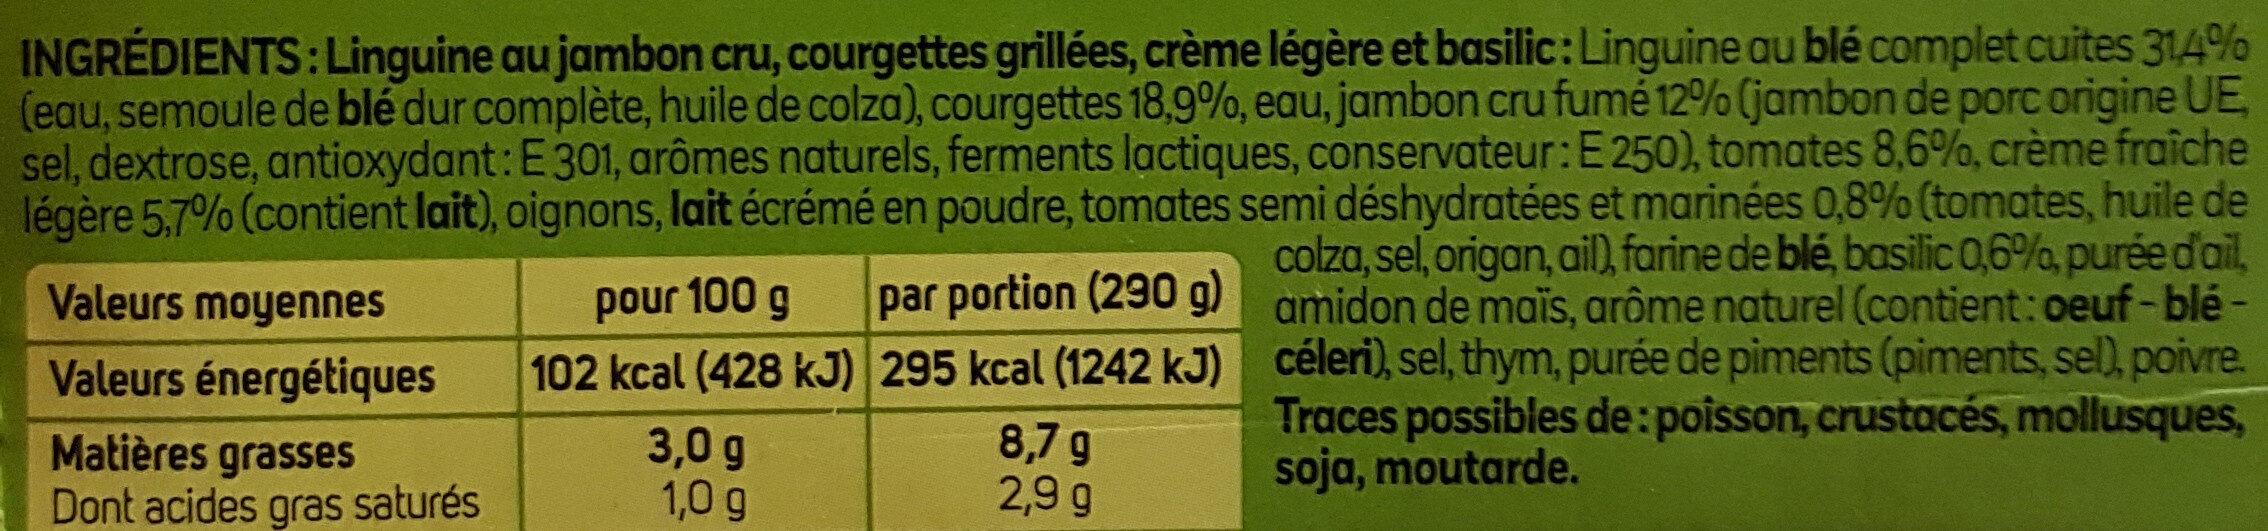 Linguine au Jambon Cru - Ingredients